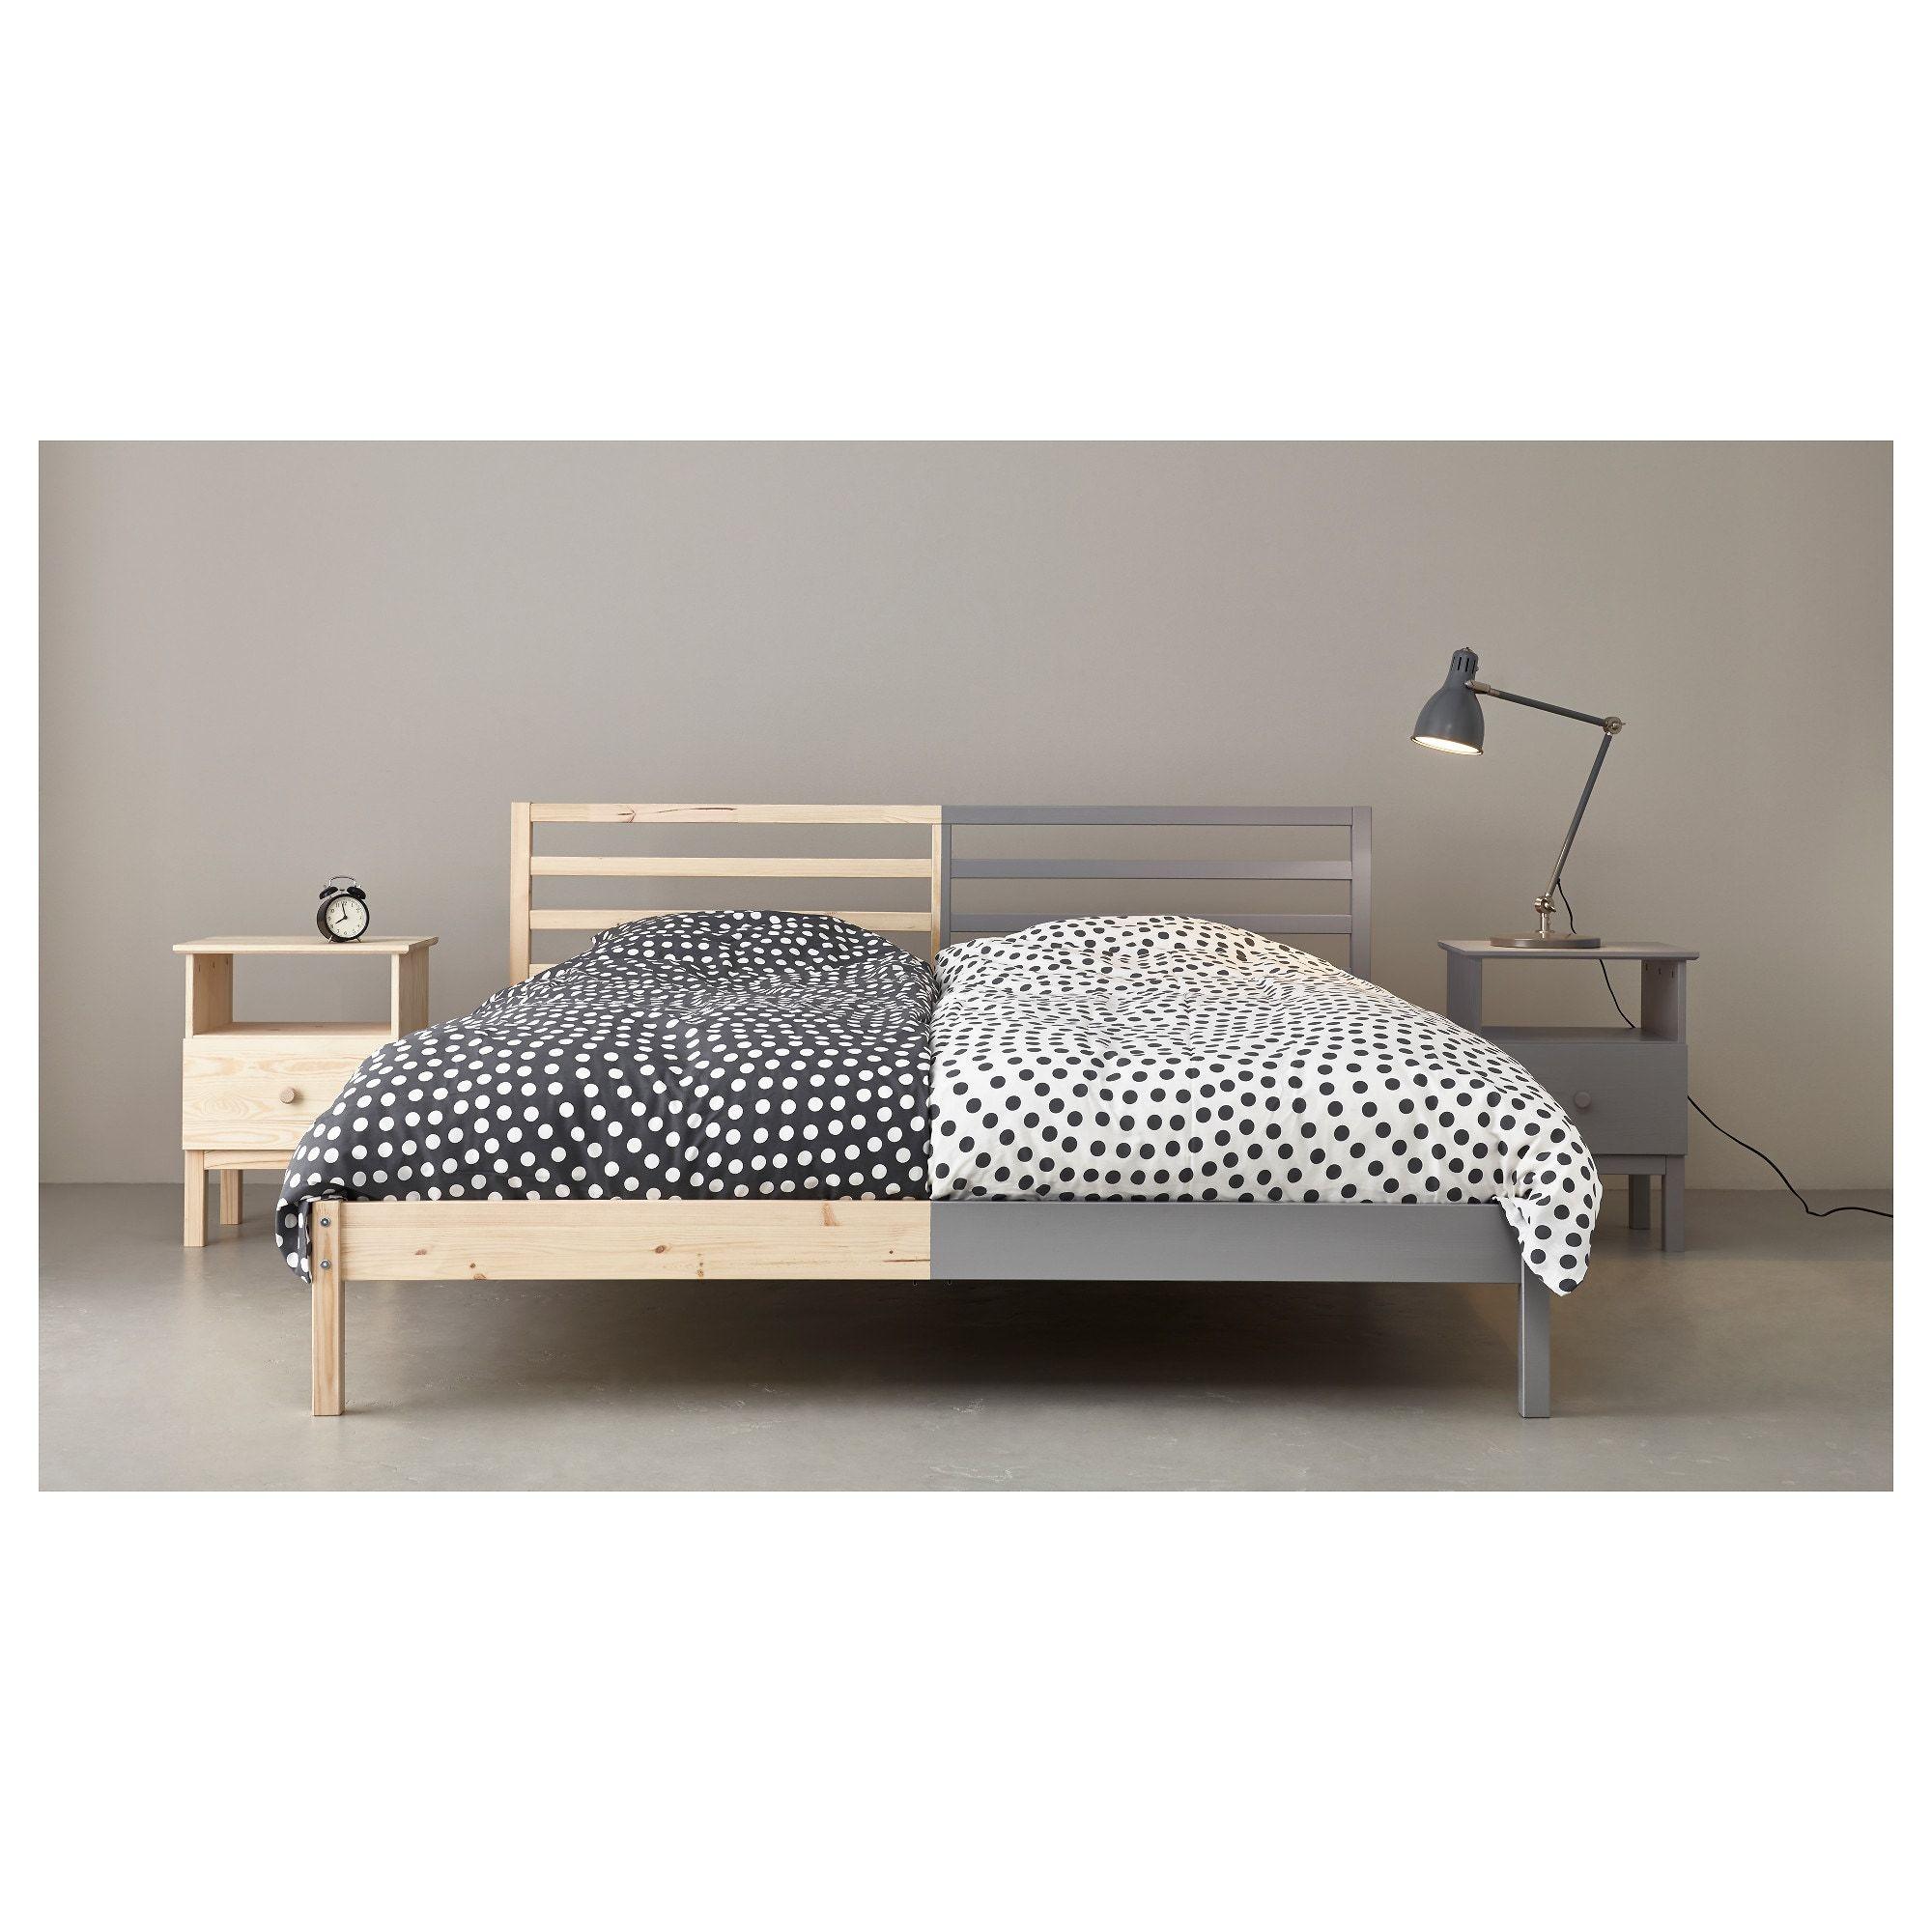 IKEA TARVA Pine, Luröy Bed frame Bed frame, Ikea bed